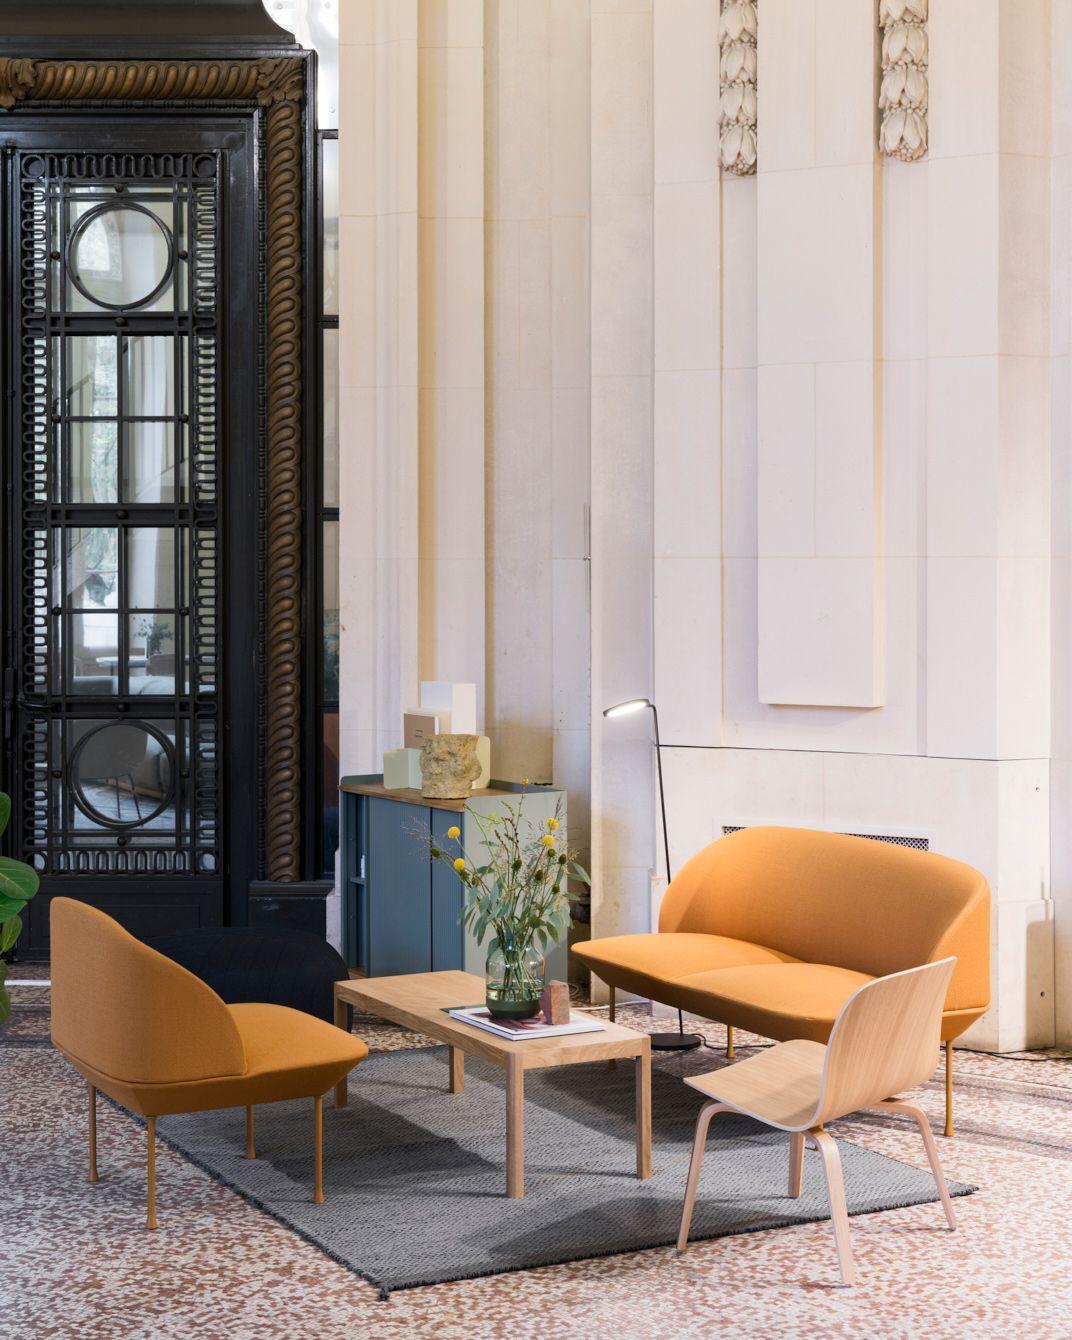 Scandinavian Sofa Inspiration From Muuto The Oslo Sofa Family Unites Geometric Li Lounge Chairs Living Room Living Room Scandinavian Scandinavian Lounge Chair